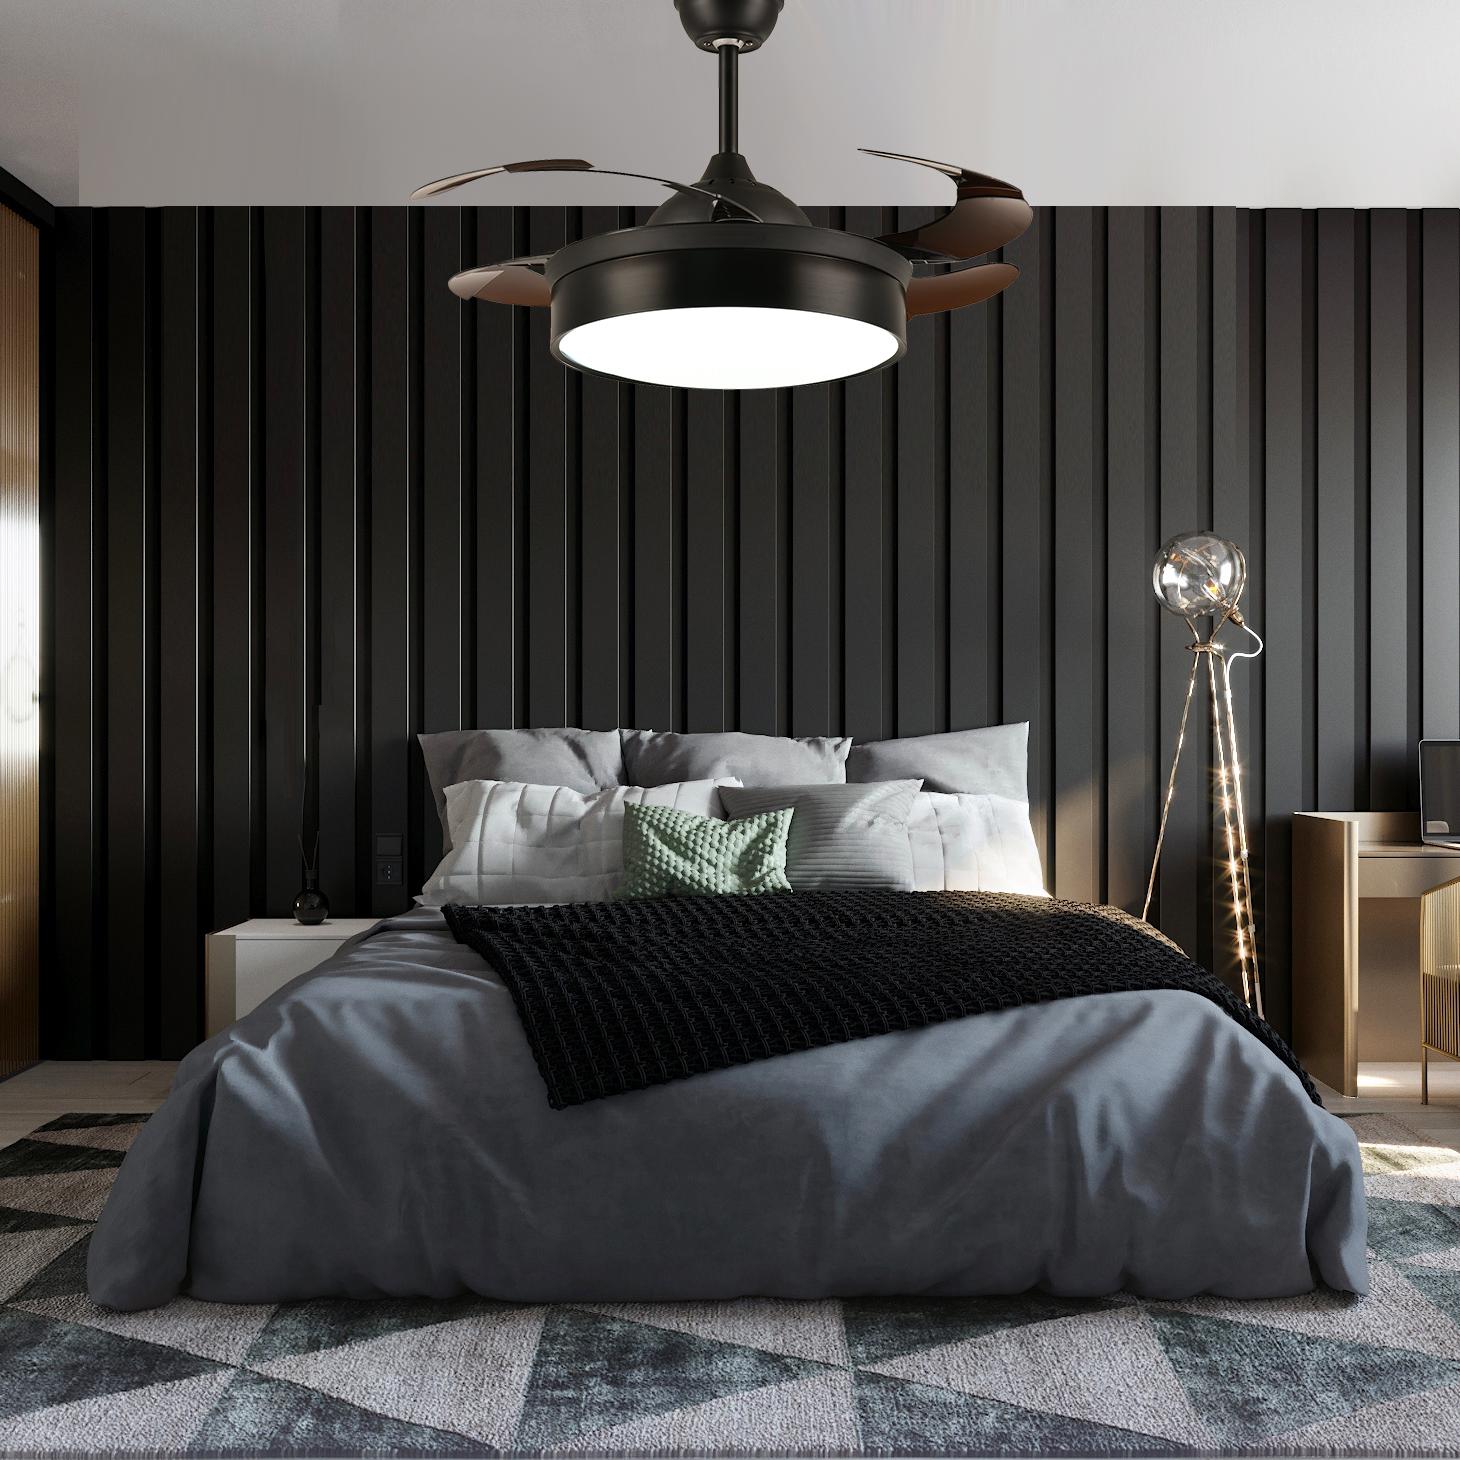 Modern Ceiling Fan With Lighting Bedroom Modern